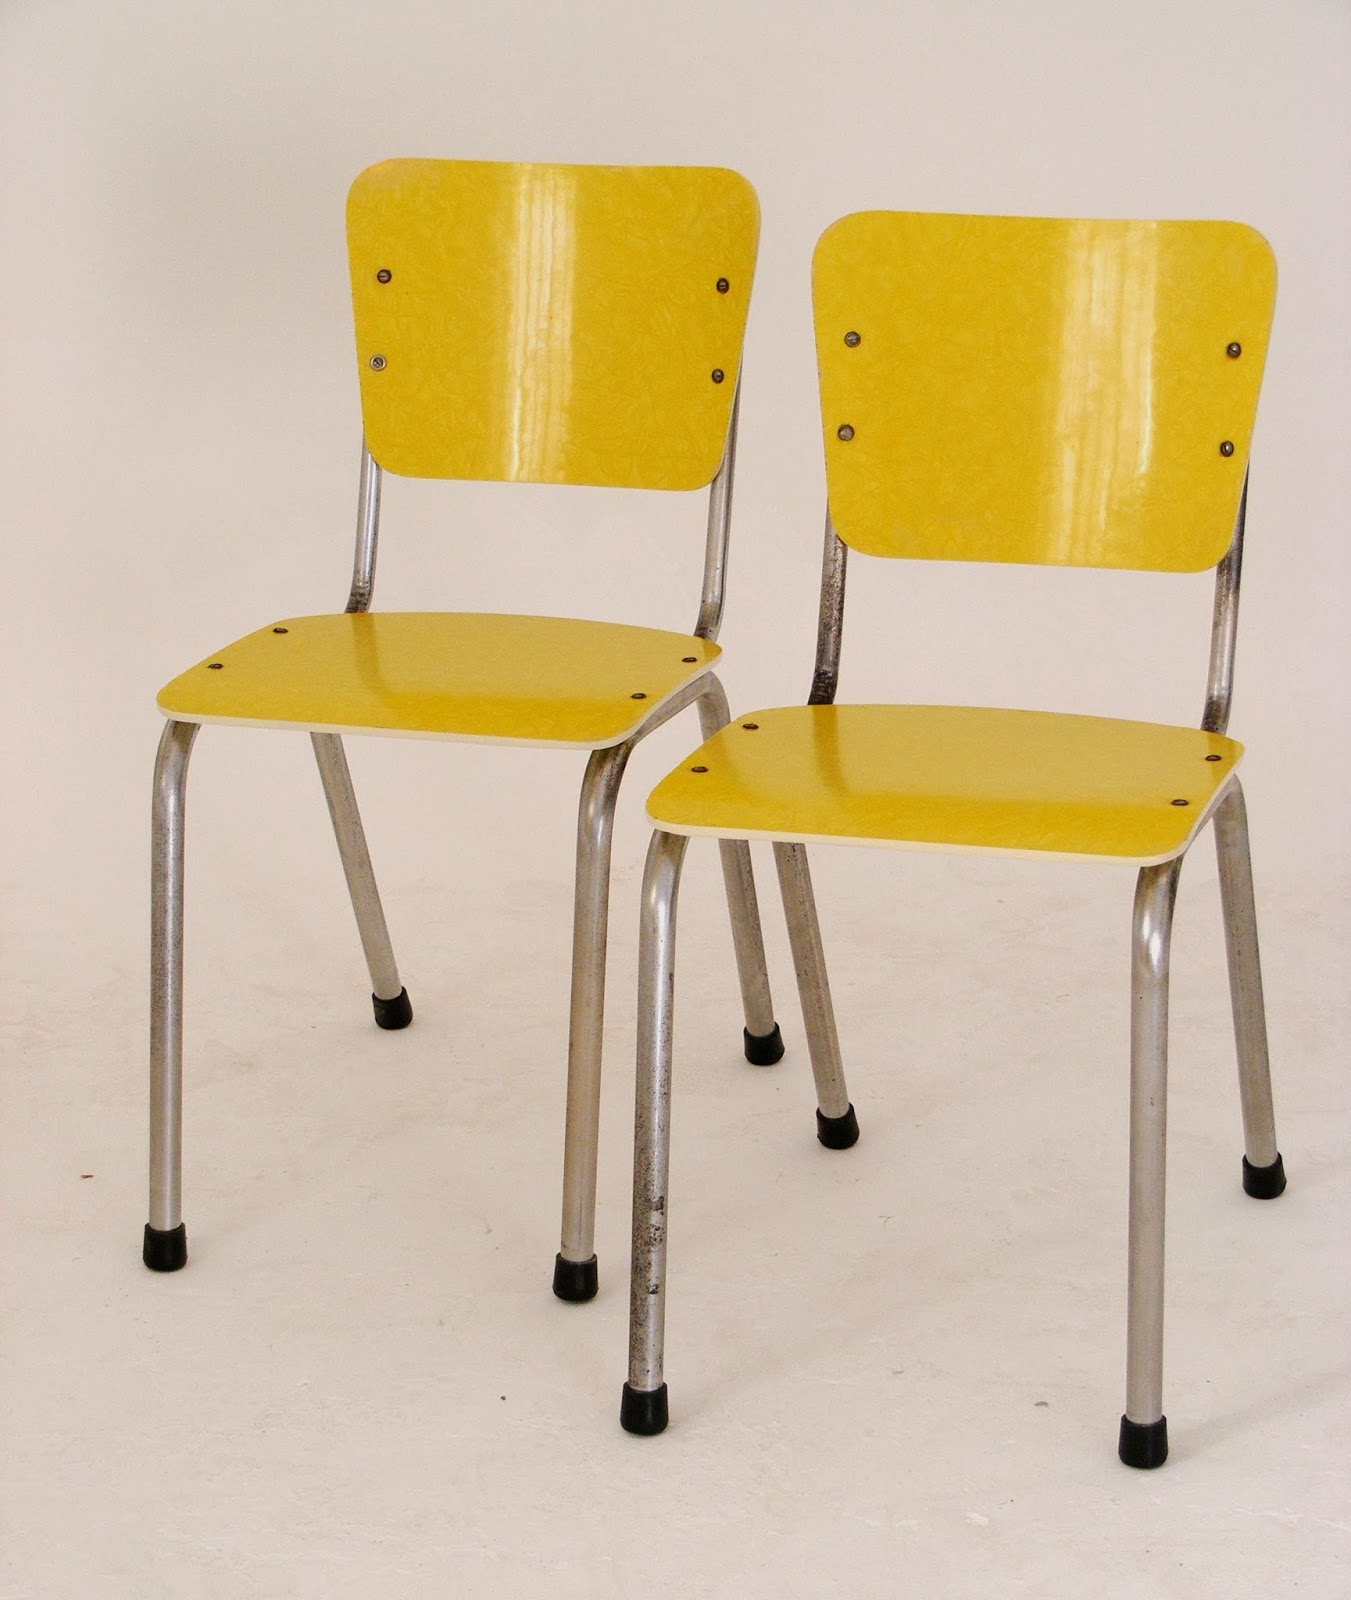 retro kitchen chairs yellow photo - 3